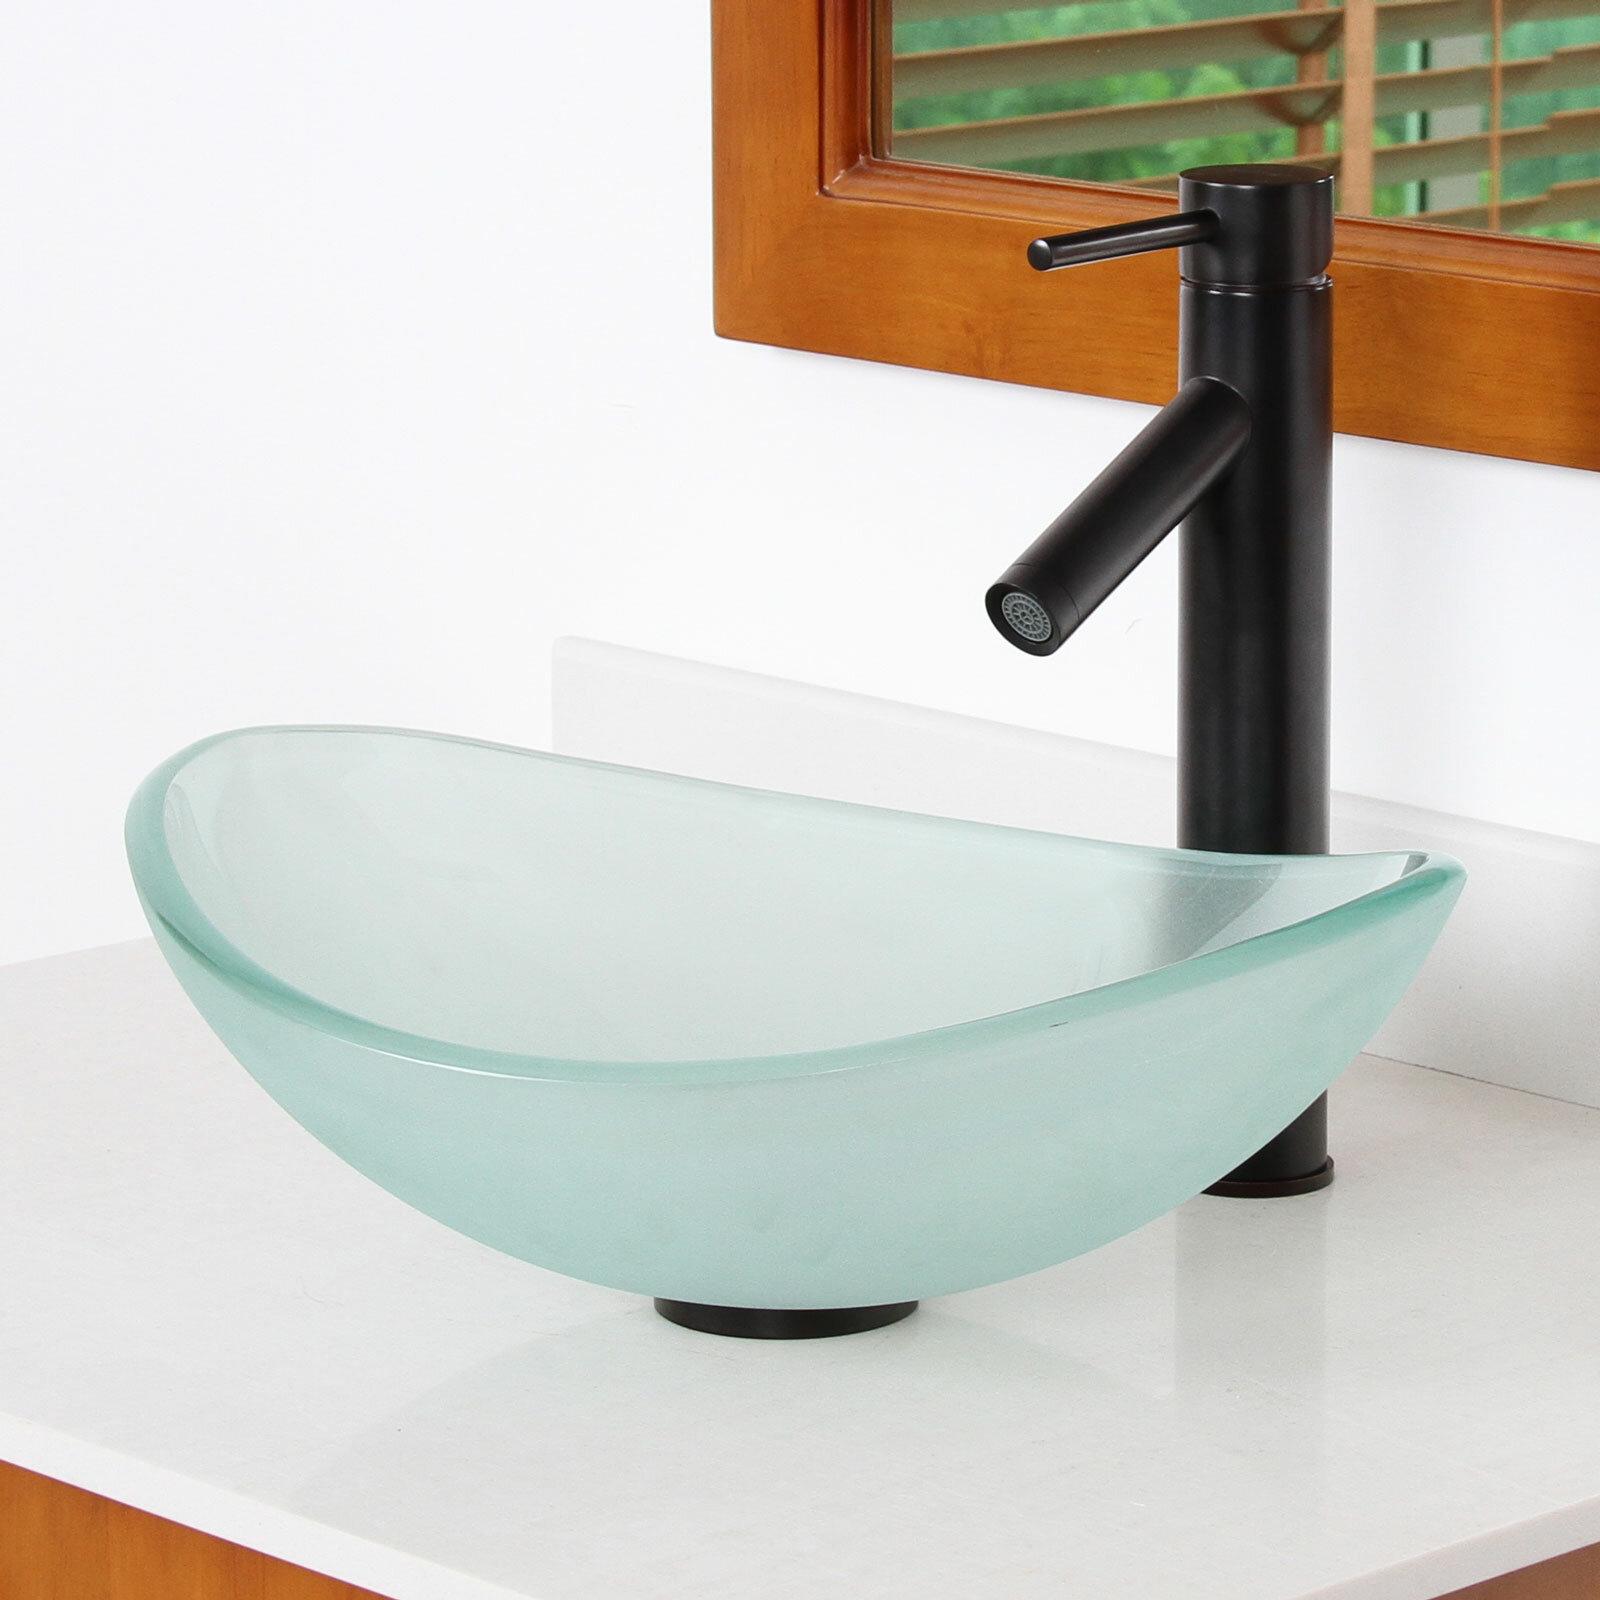 Elite Mini Tempered Glass Oval Vessel Bathroom Sink Reviews Wayfair